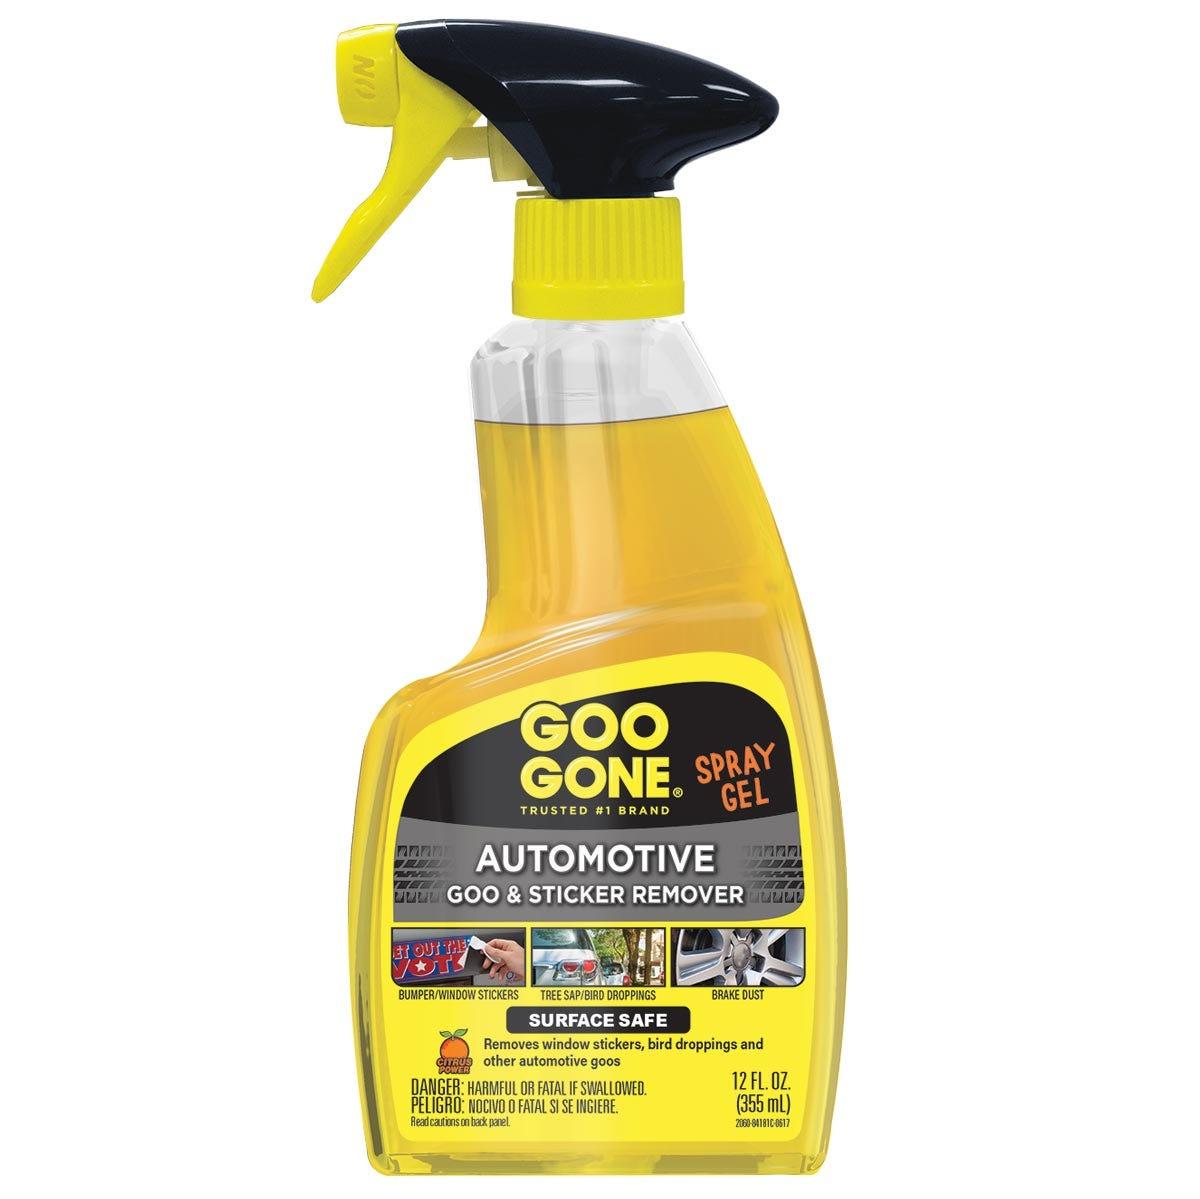 https://googone.com/media/catalog/product/a/u/automotive-adhesive-remover-spray-gel_front_1.jpg